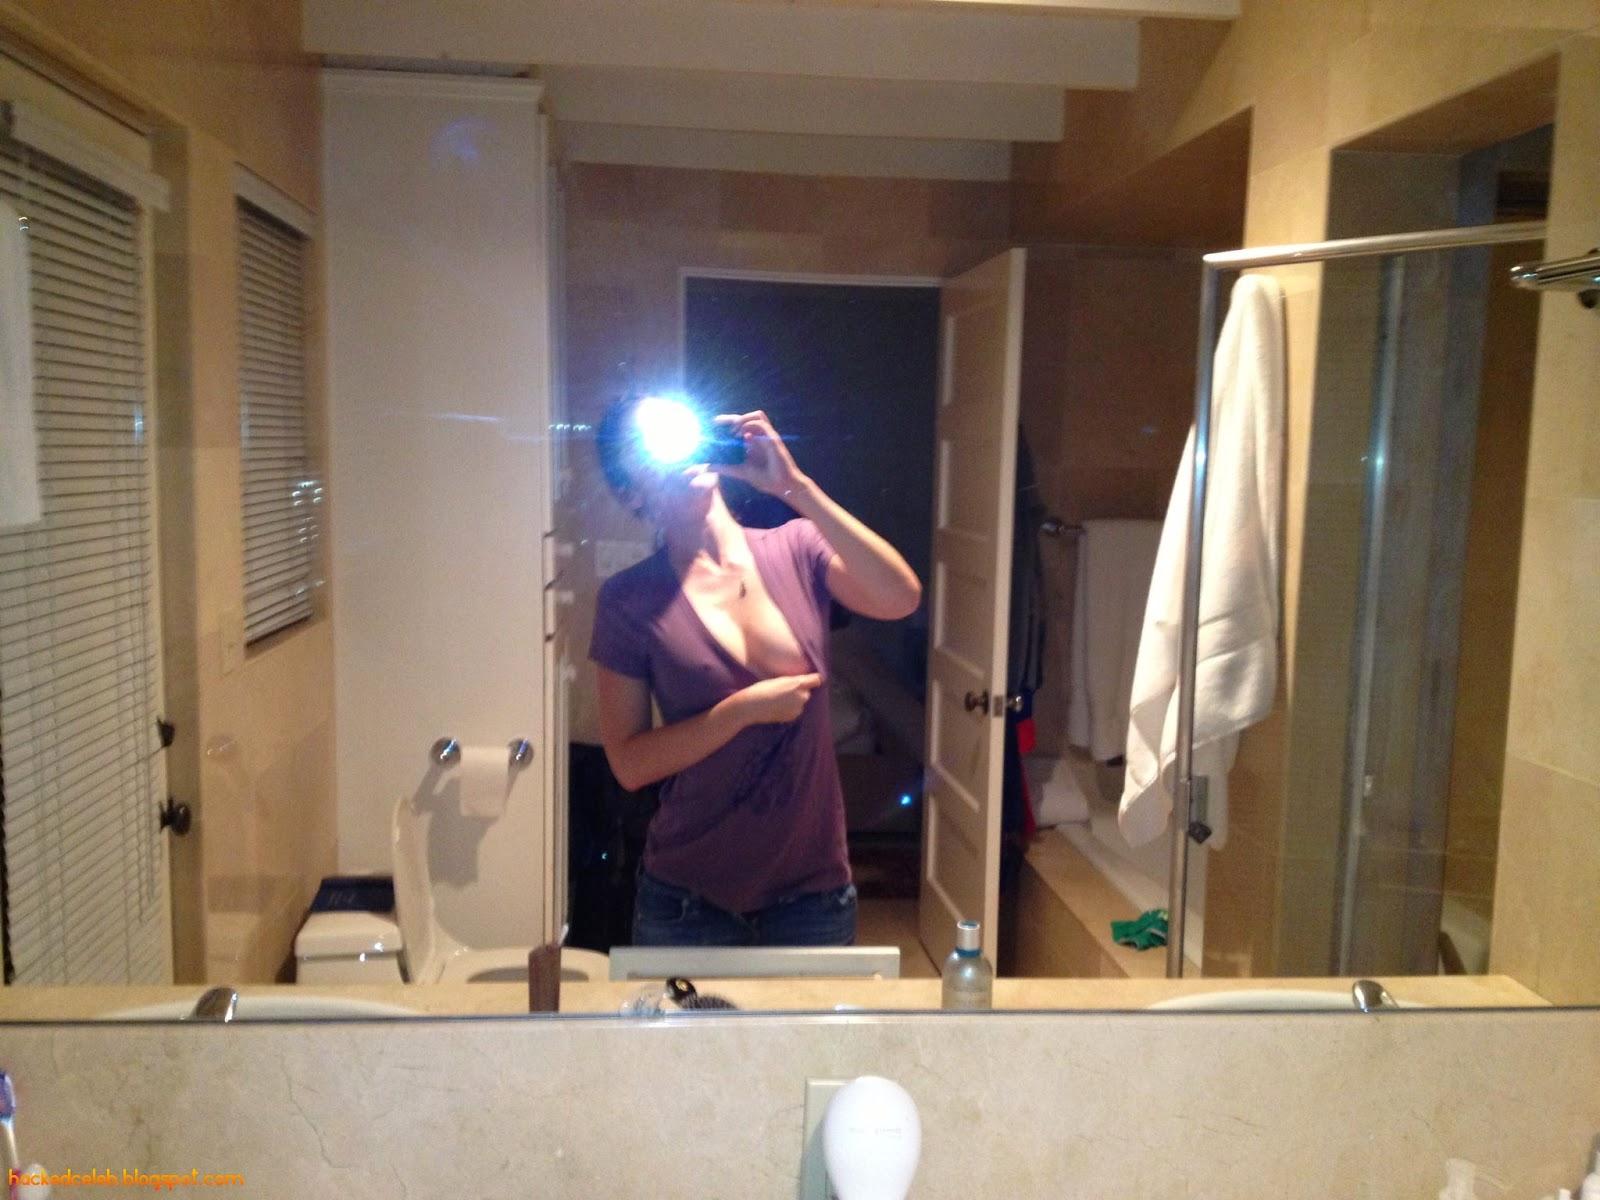 lizzy-caplan-nude-leaked-icloud-hacked-celebrity-5